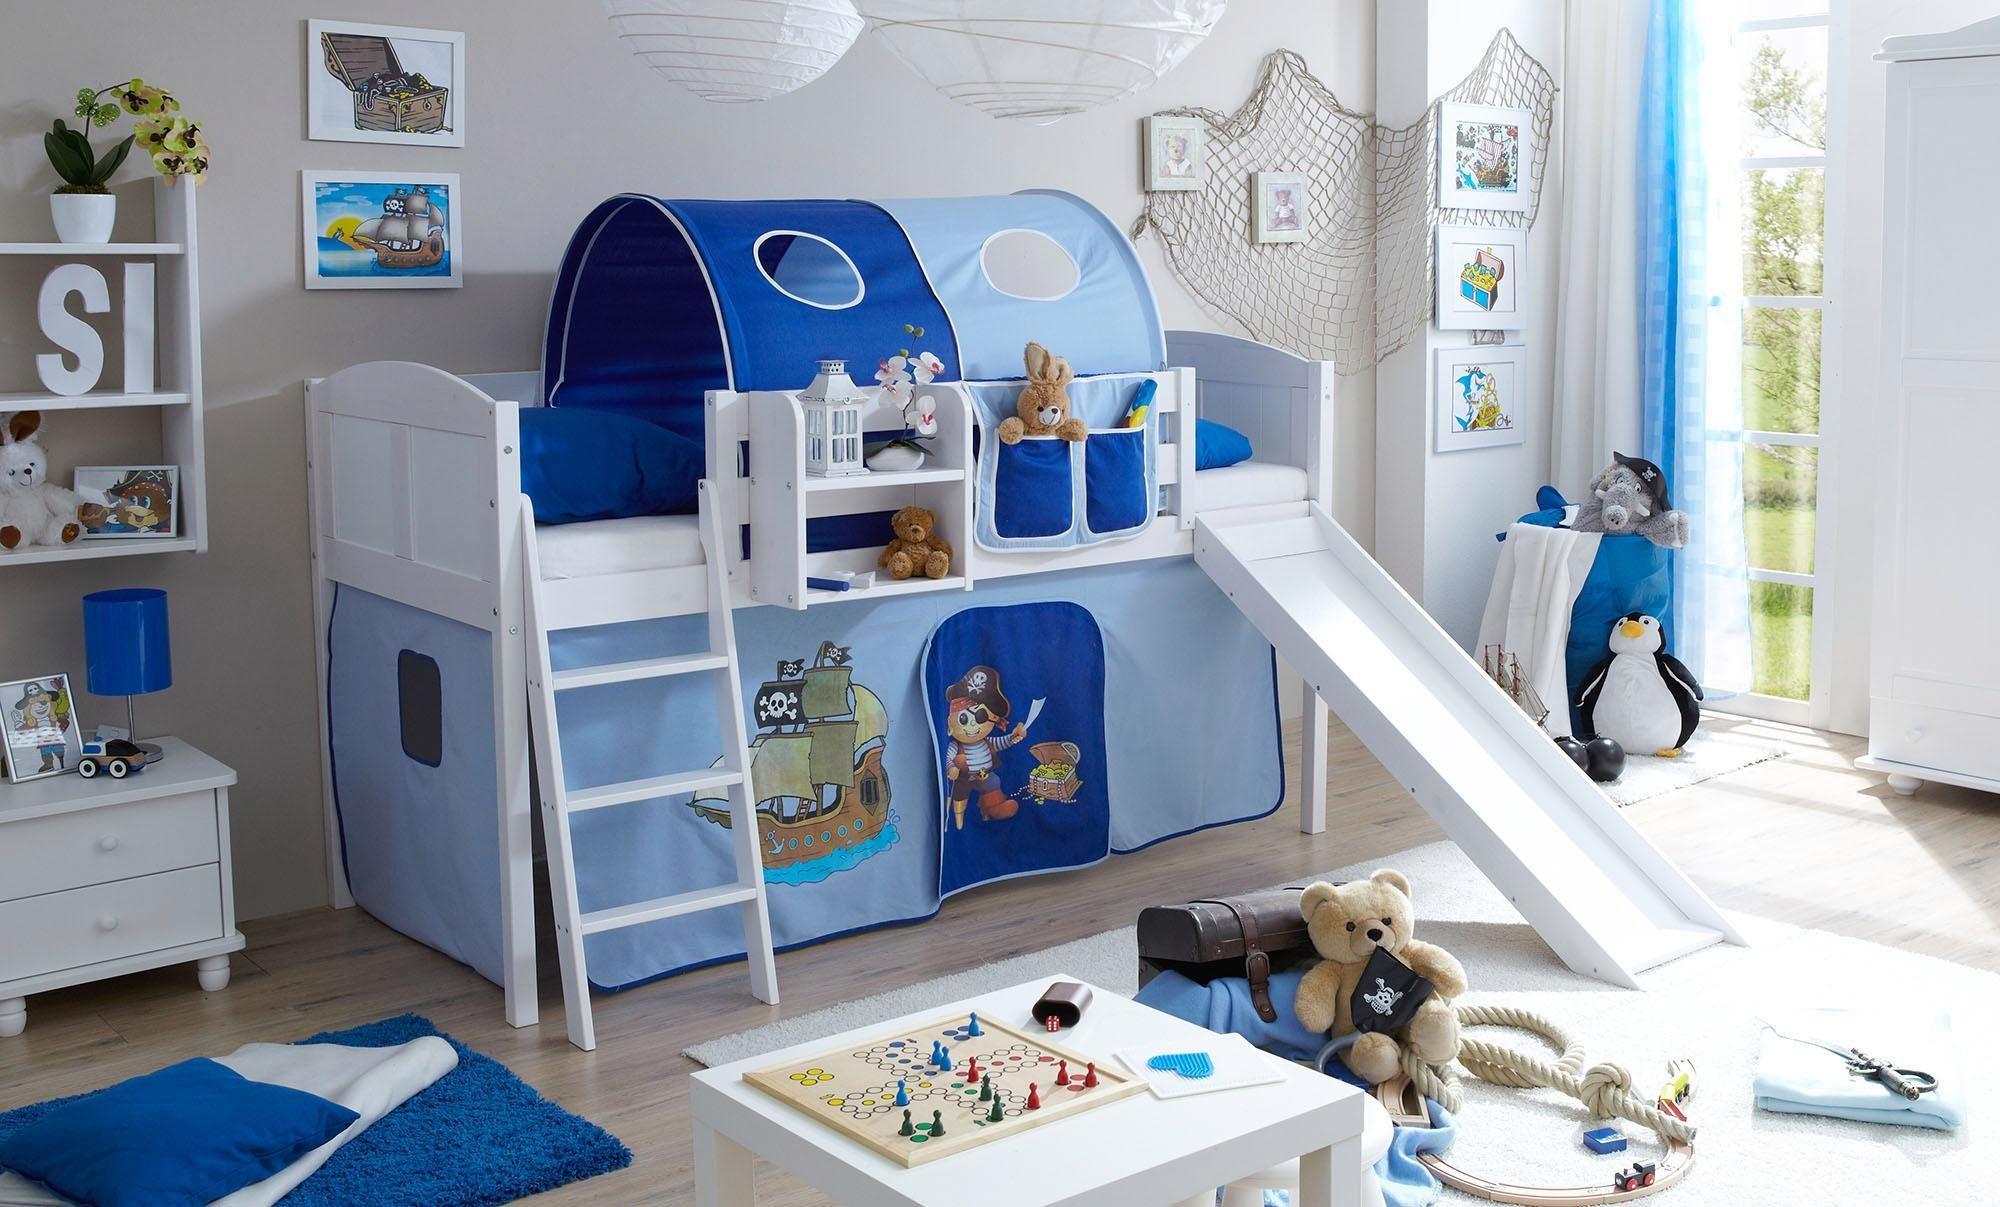 Etagenbett It Rutsche : Kinder stockbett massivholz mit rutsche ikea ansprechend hochbett